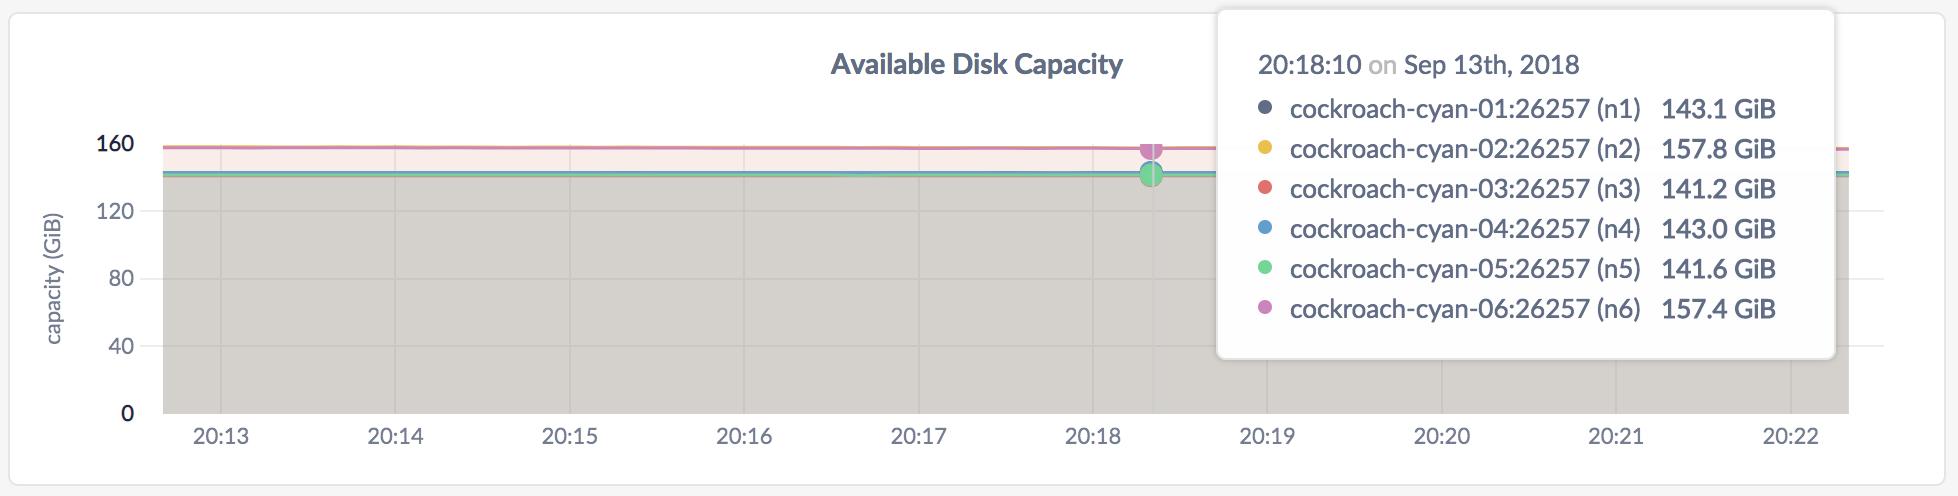 CockroachDB Admin UI Disk Capacity graph